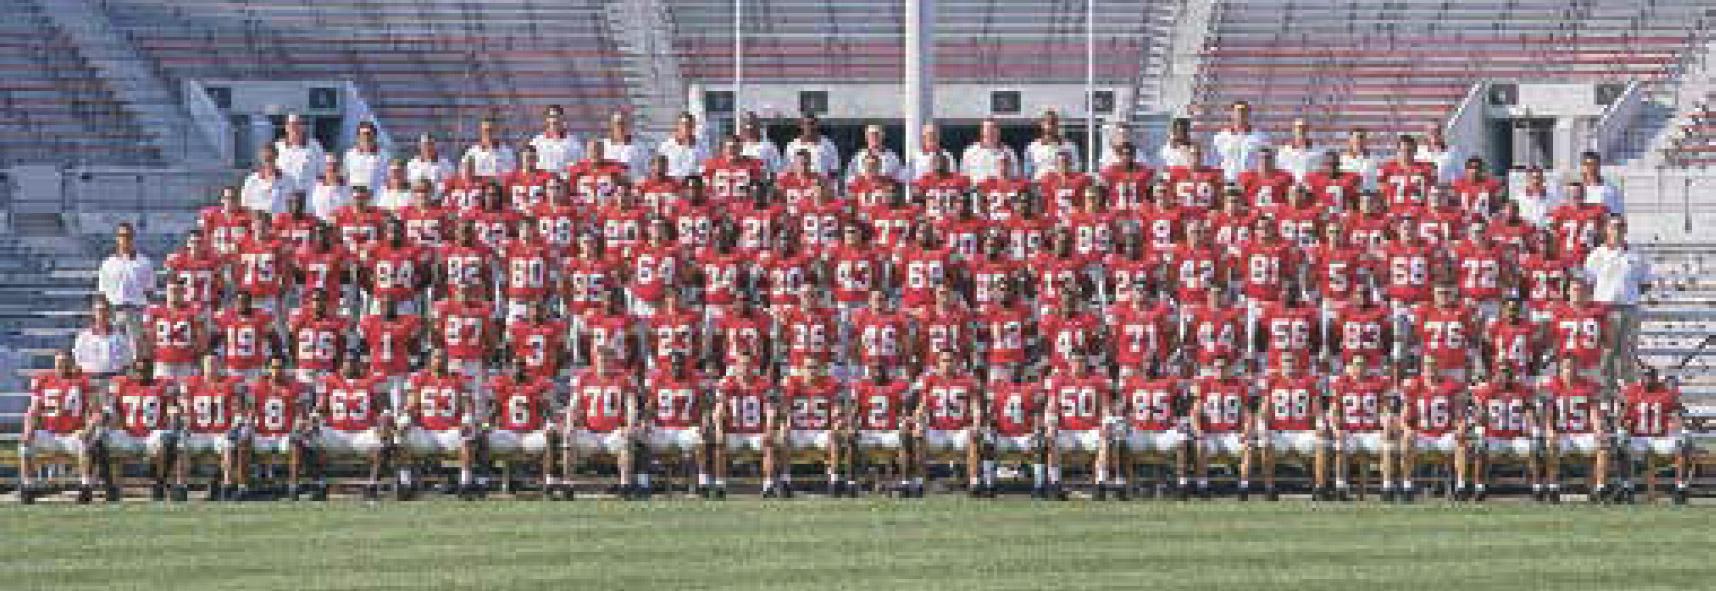 photo of ohio state football team